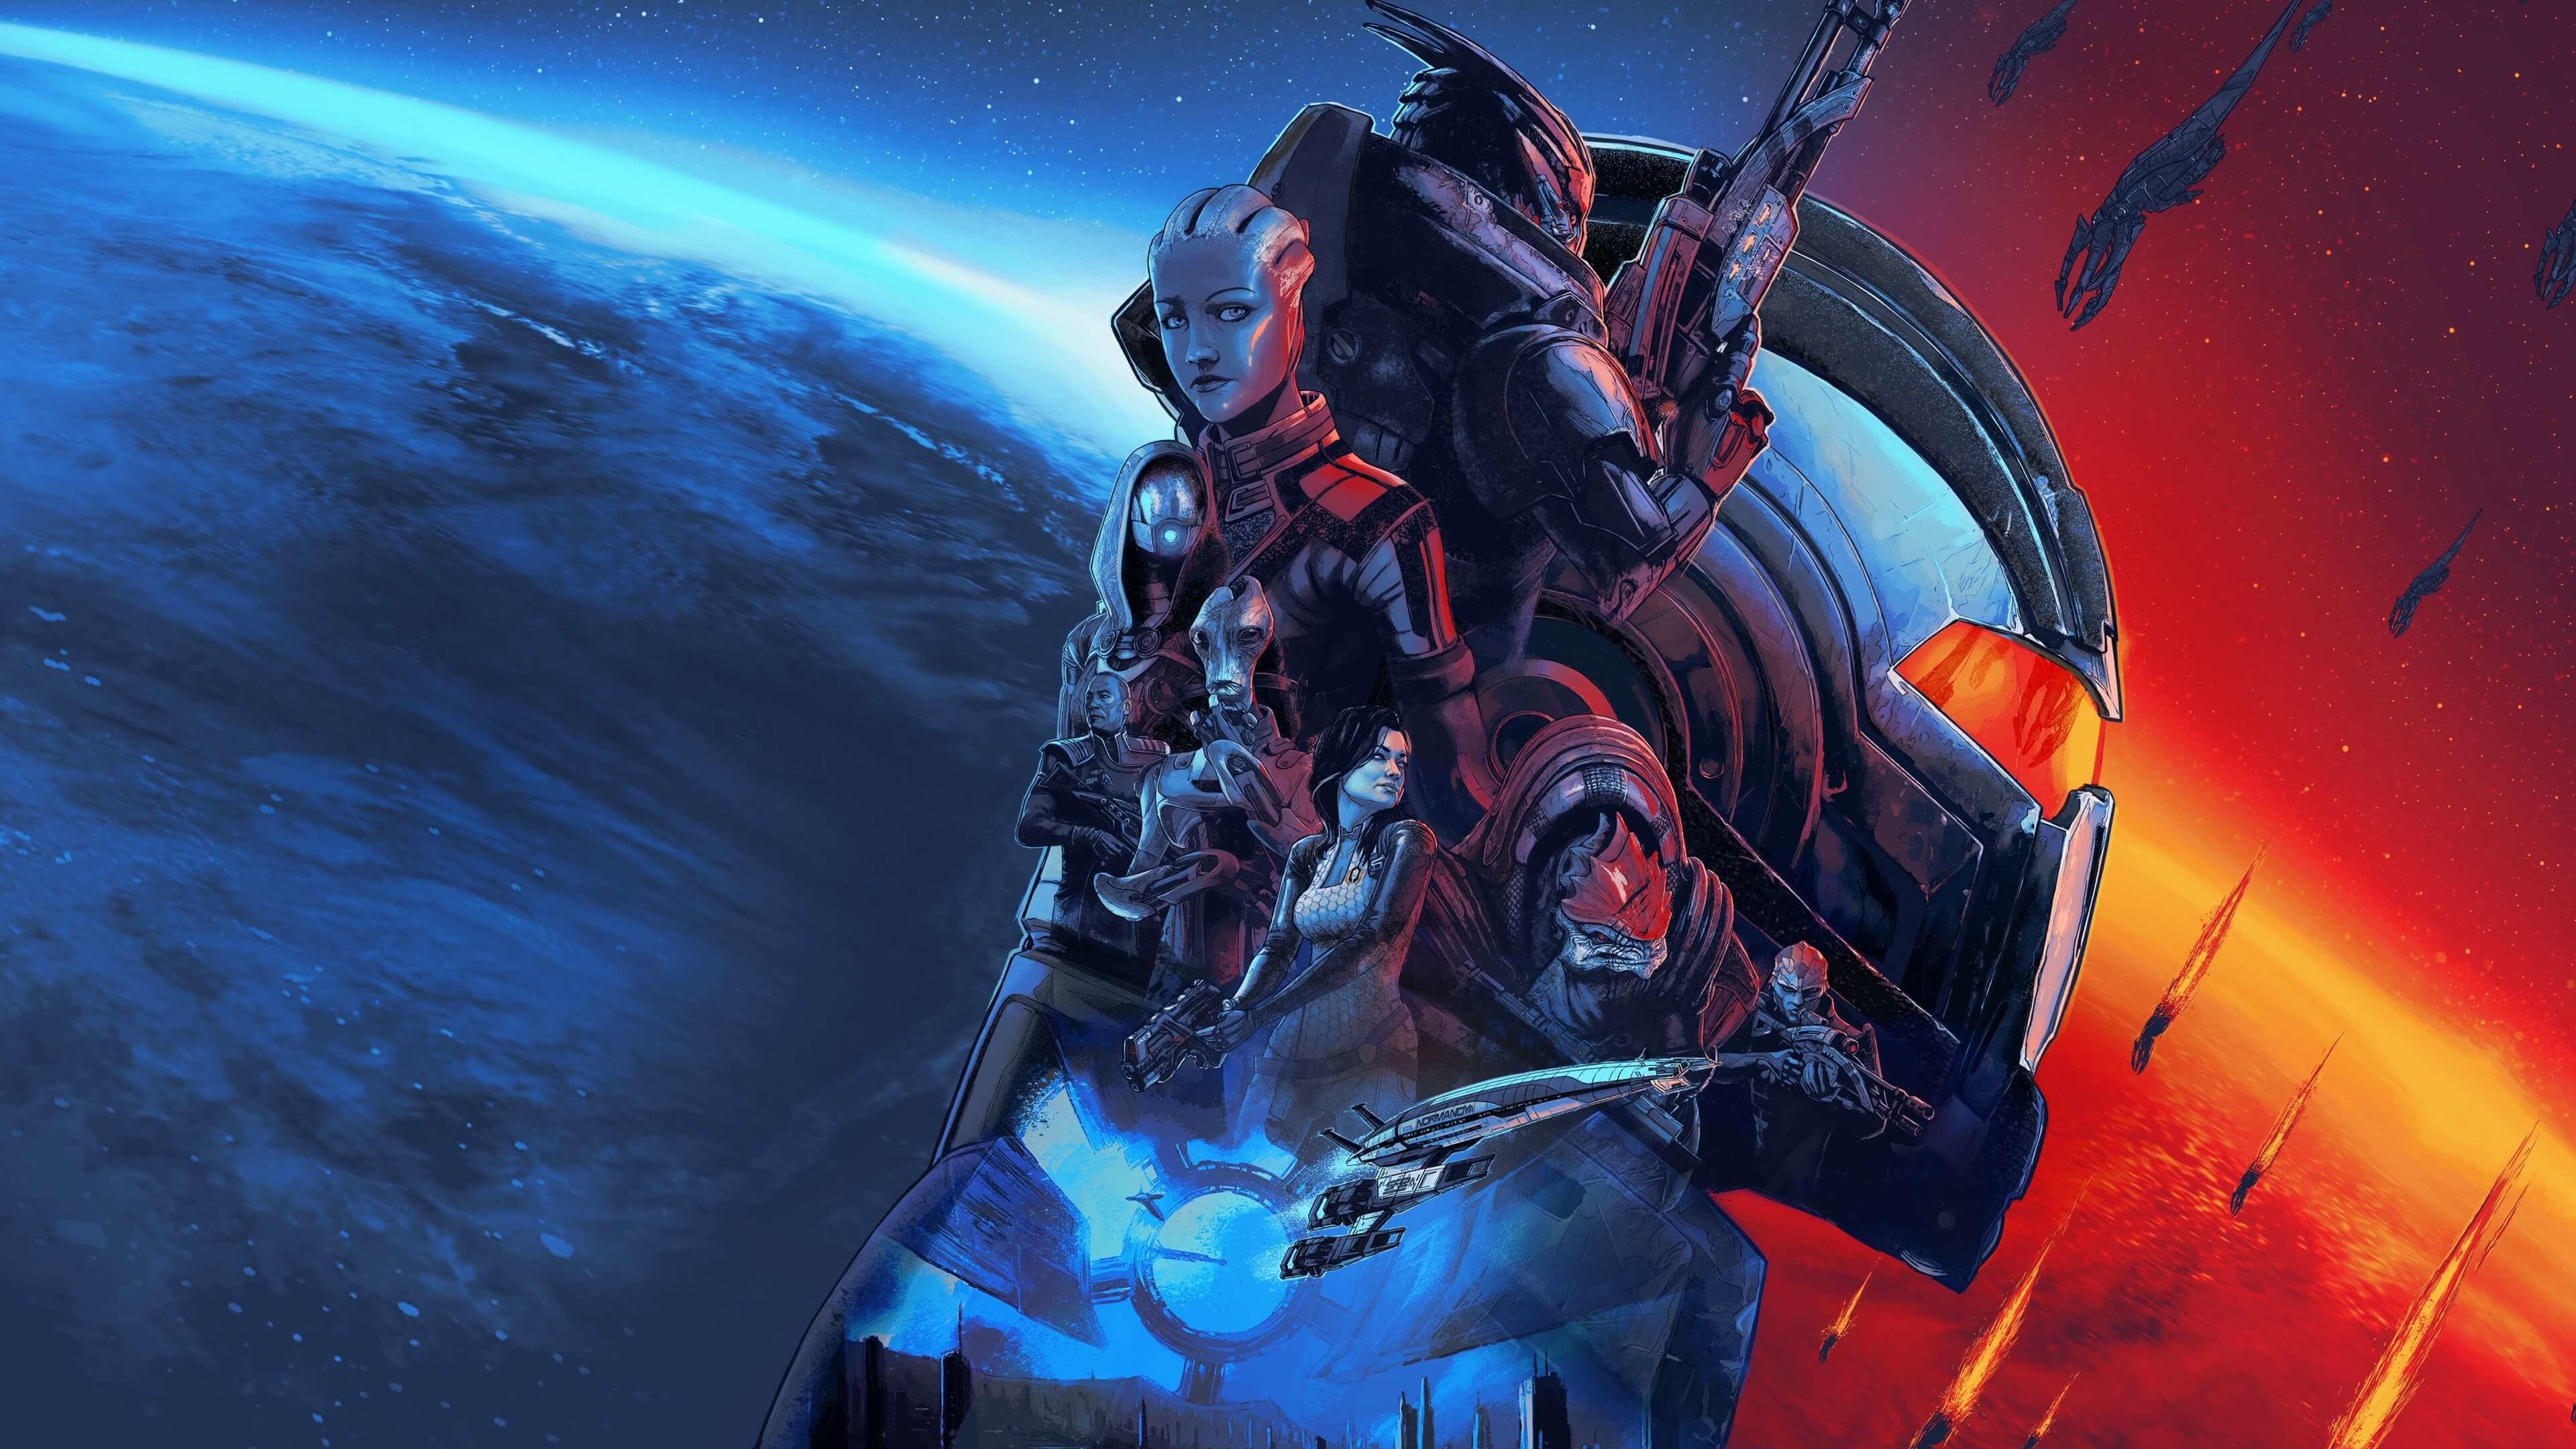 mass effect 2021 1610662096 - Mass Effect 2021 - Mass Effect 2021 wallpaper, Mass Effect 2021 4k wallpaper